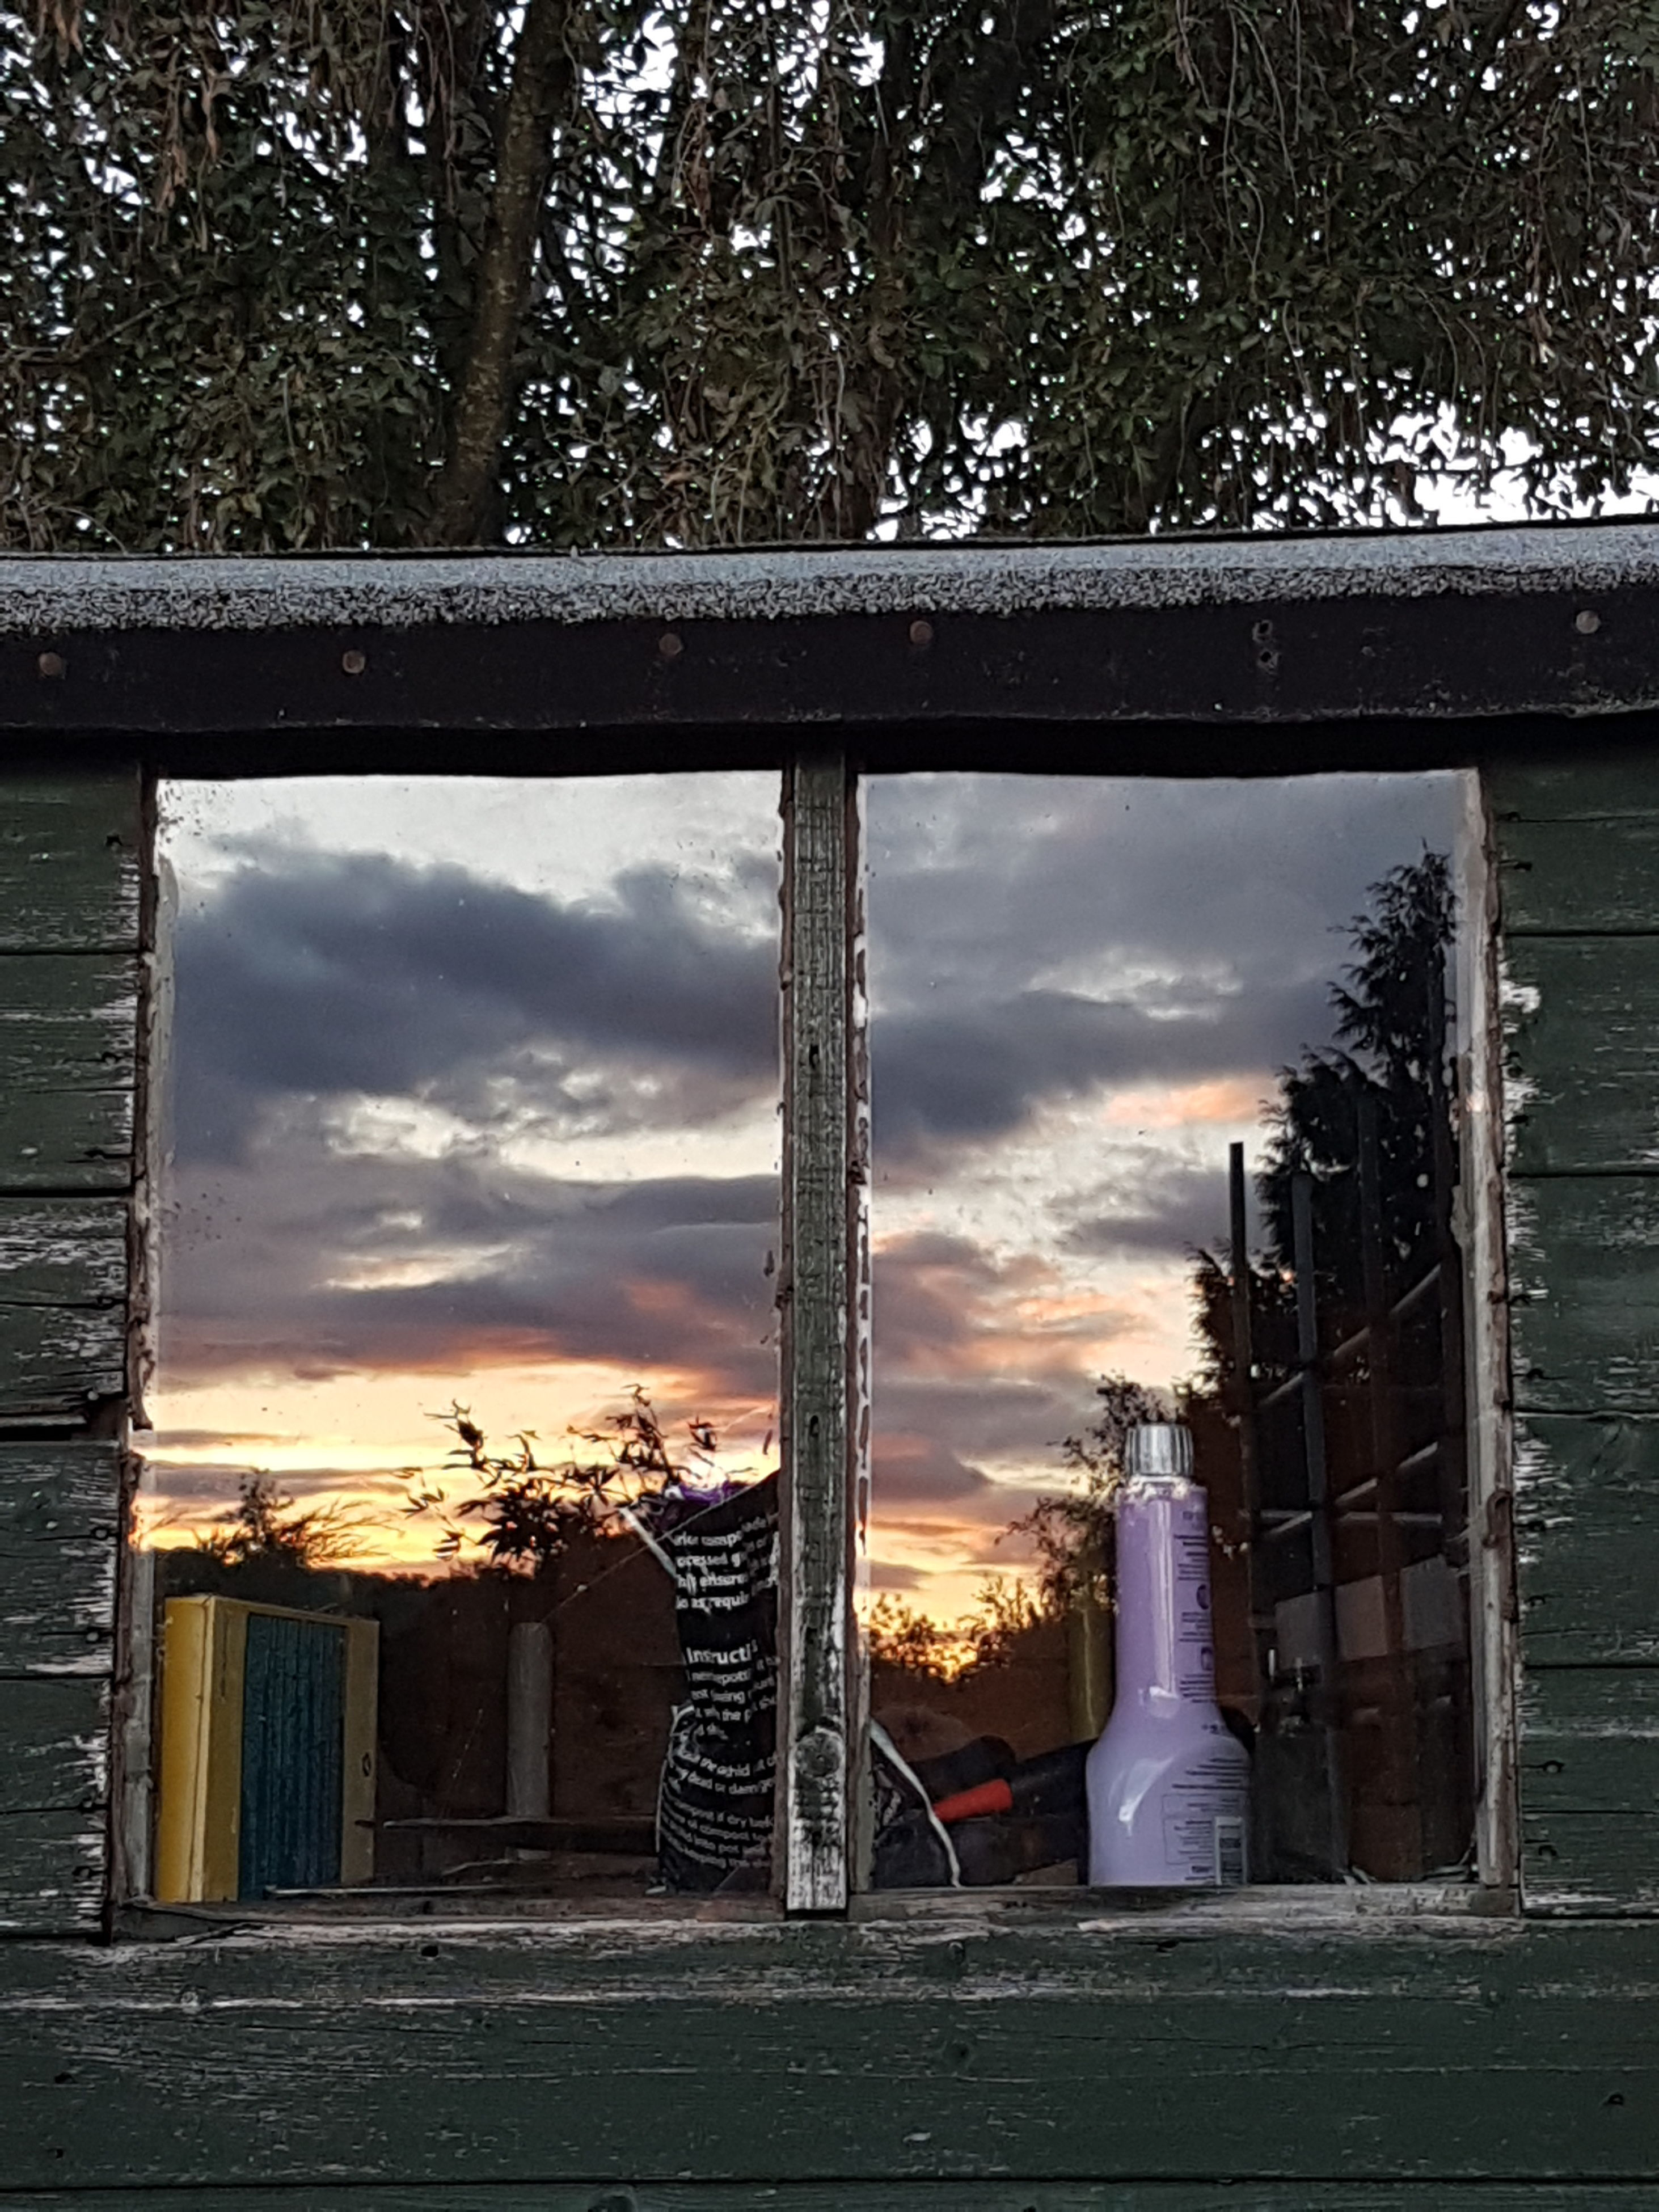 built structure, architecture, building exterior, tree, sunset, entrance, outdoors, architectural column, orange color, sky, cloud - sky, no people, facade